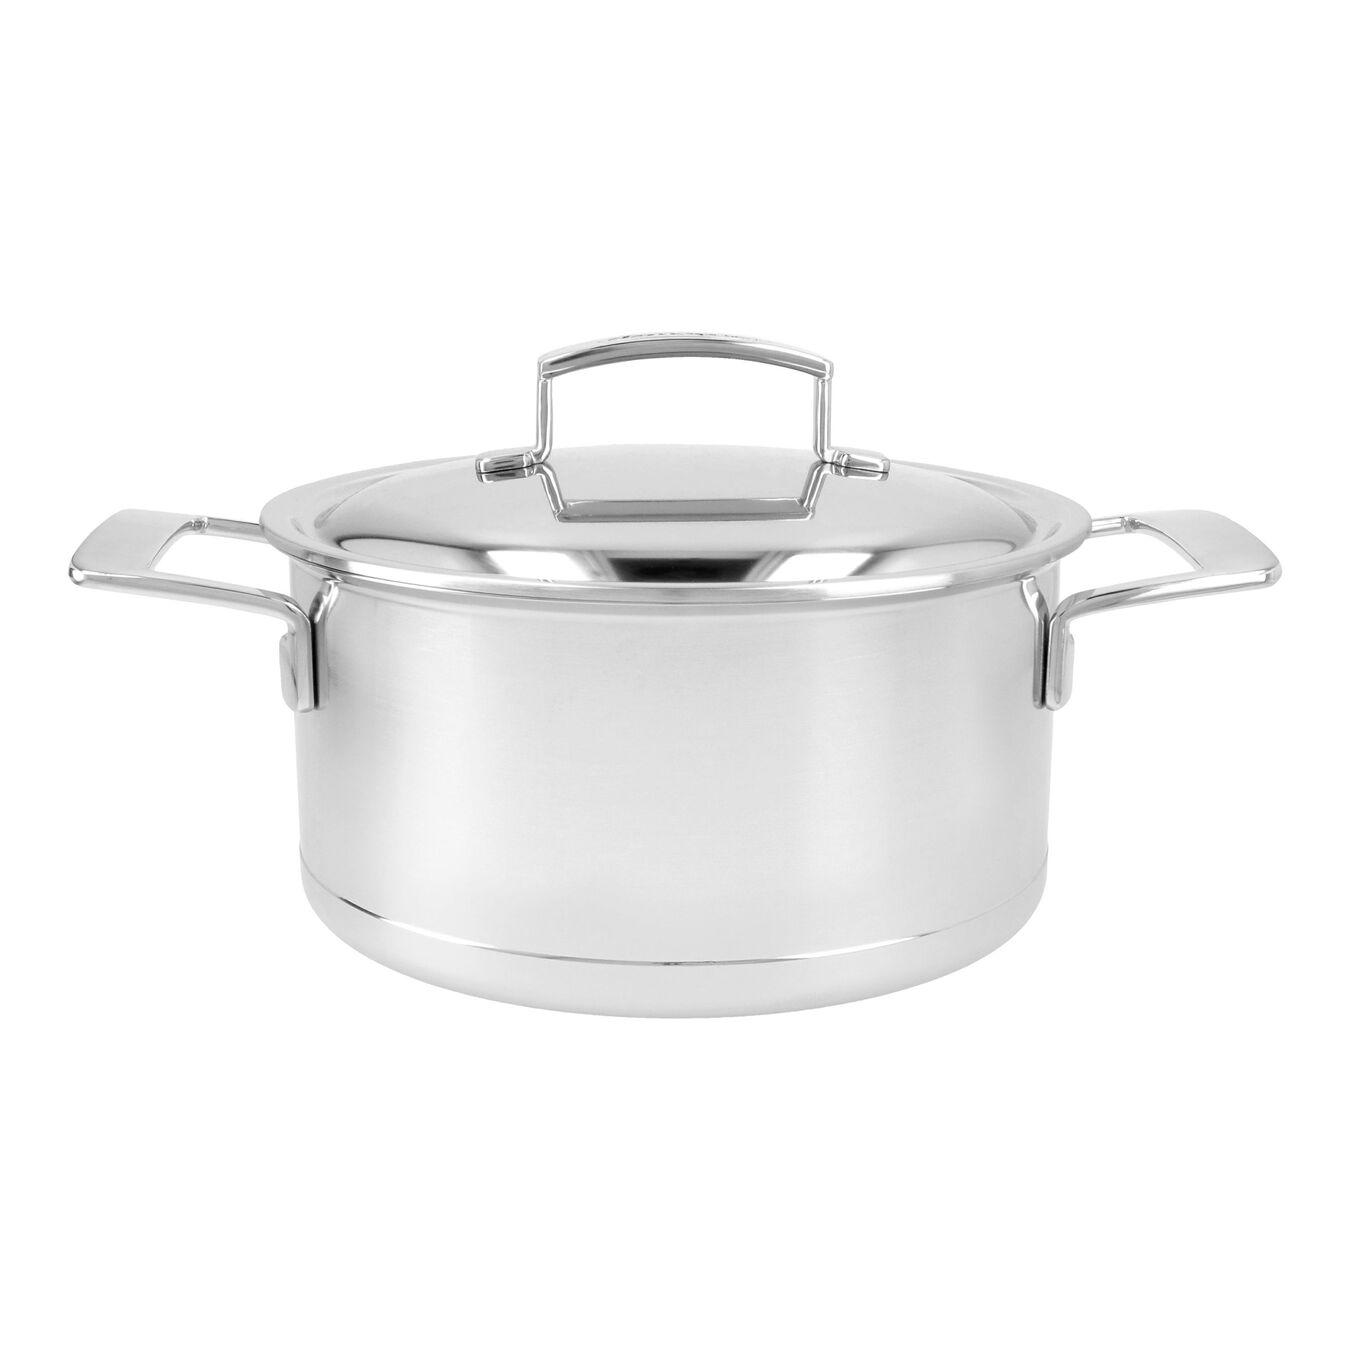 Kookpot met dubbelwandig deksel 22 cm / 4 l,,large 1